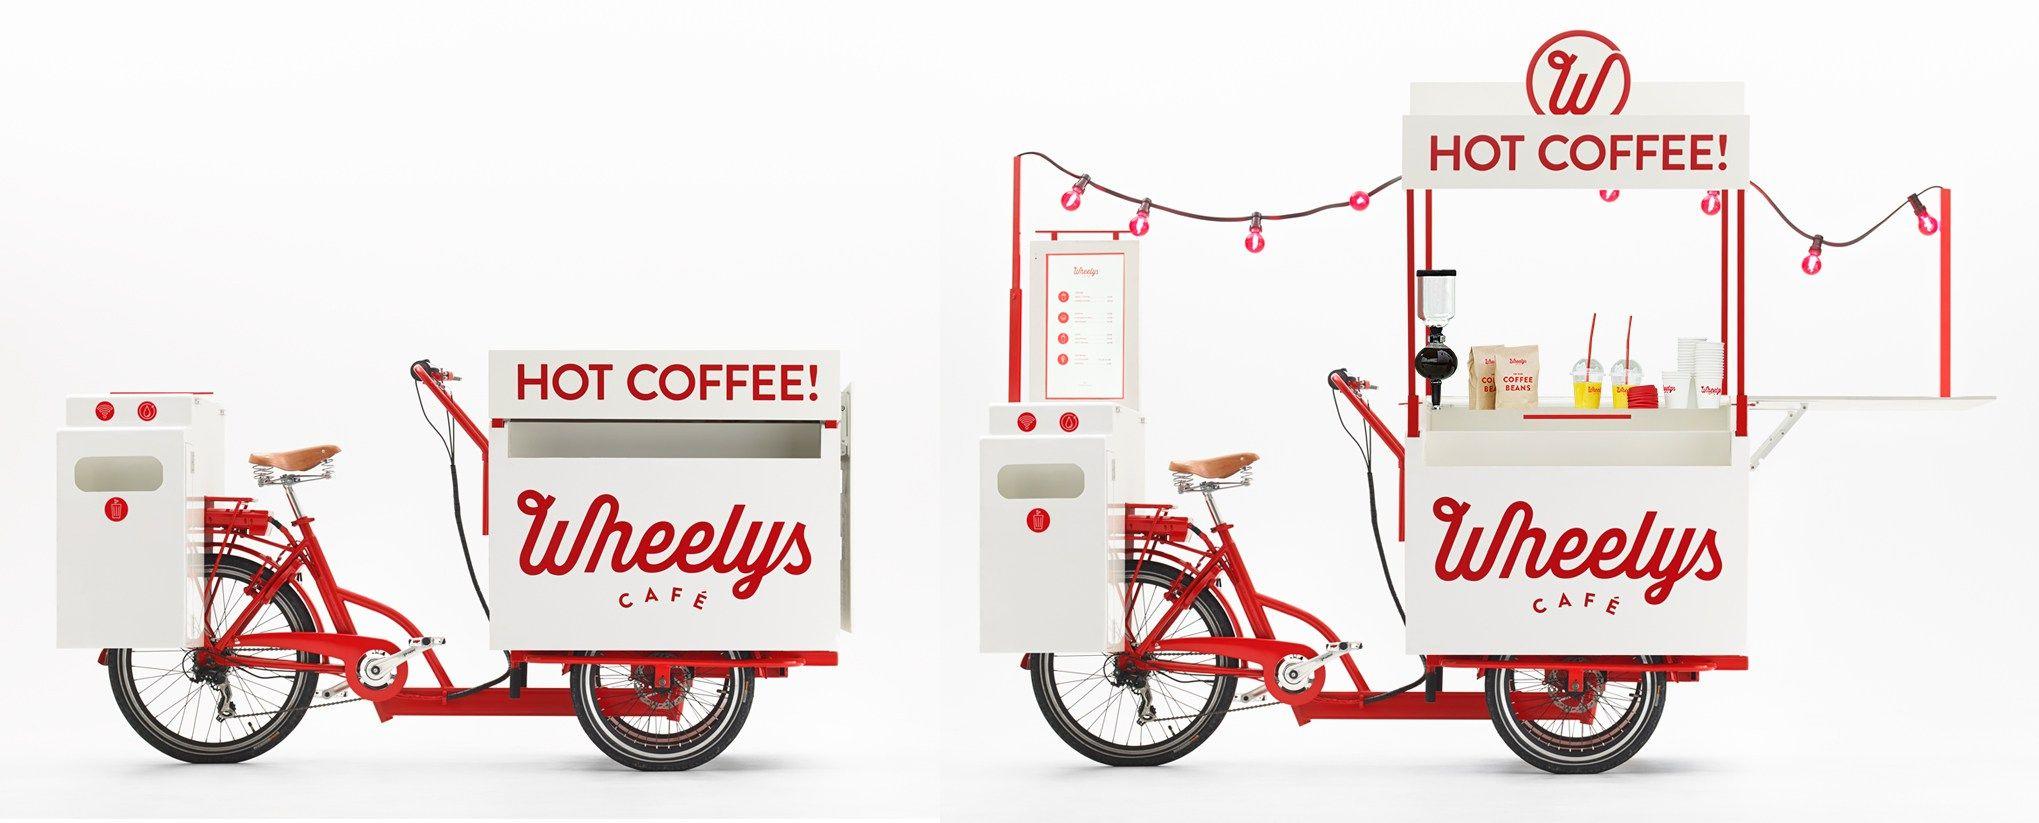 Wheelys Cafe Mobile Cafe Bicycle Cafe Coffee Bike